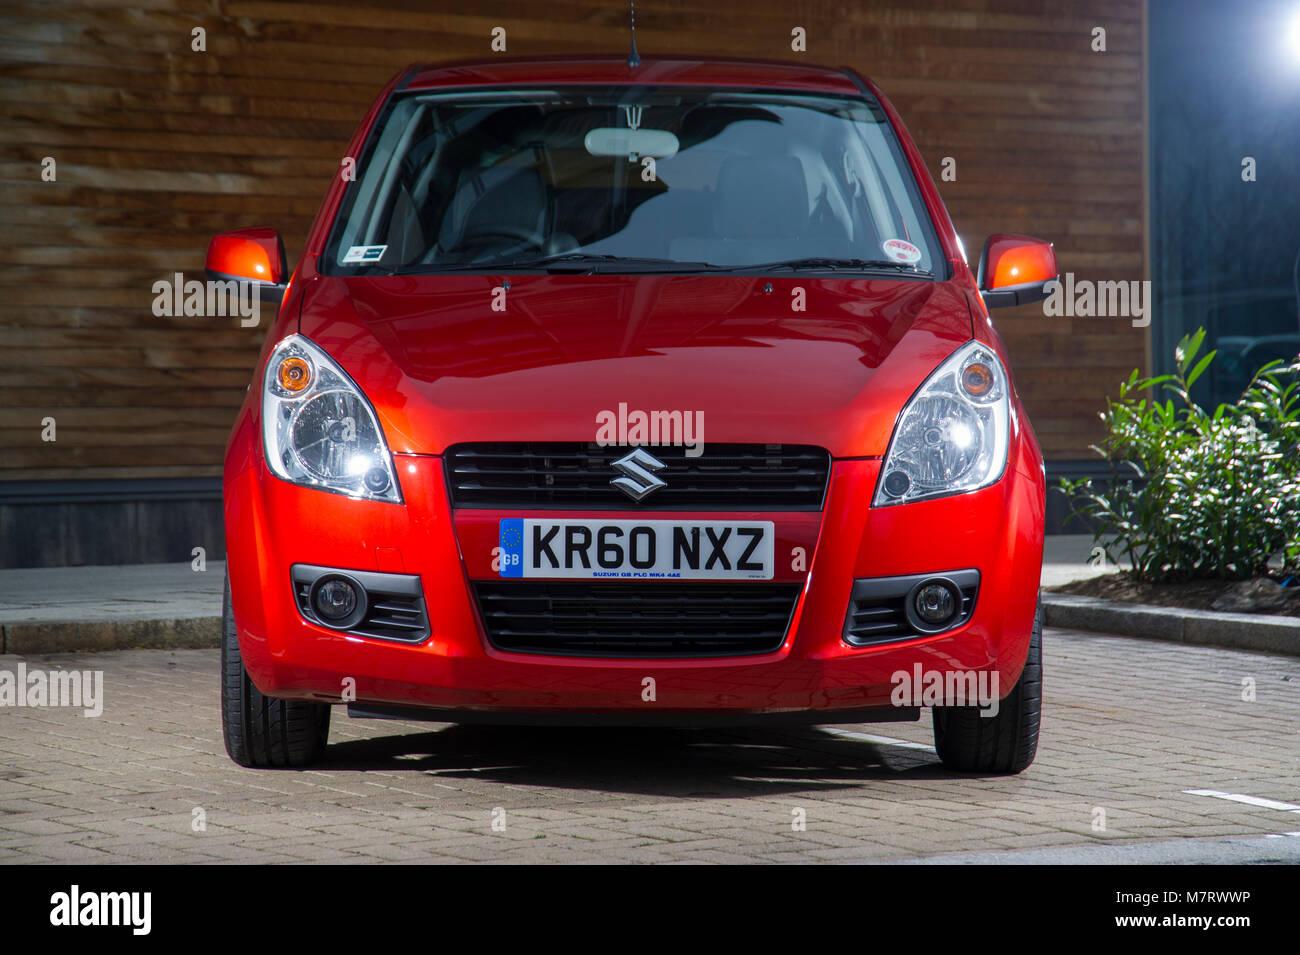 2011 Suzuki Splash city car Immagini Stock